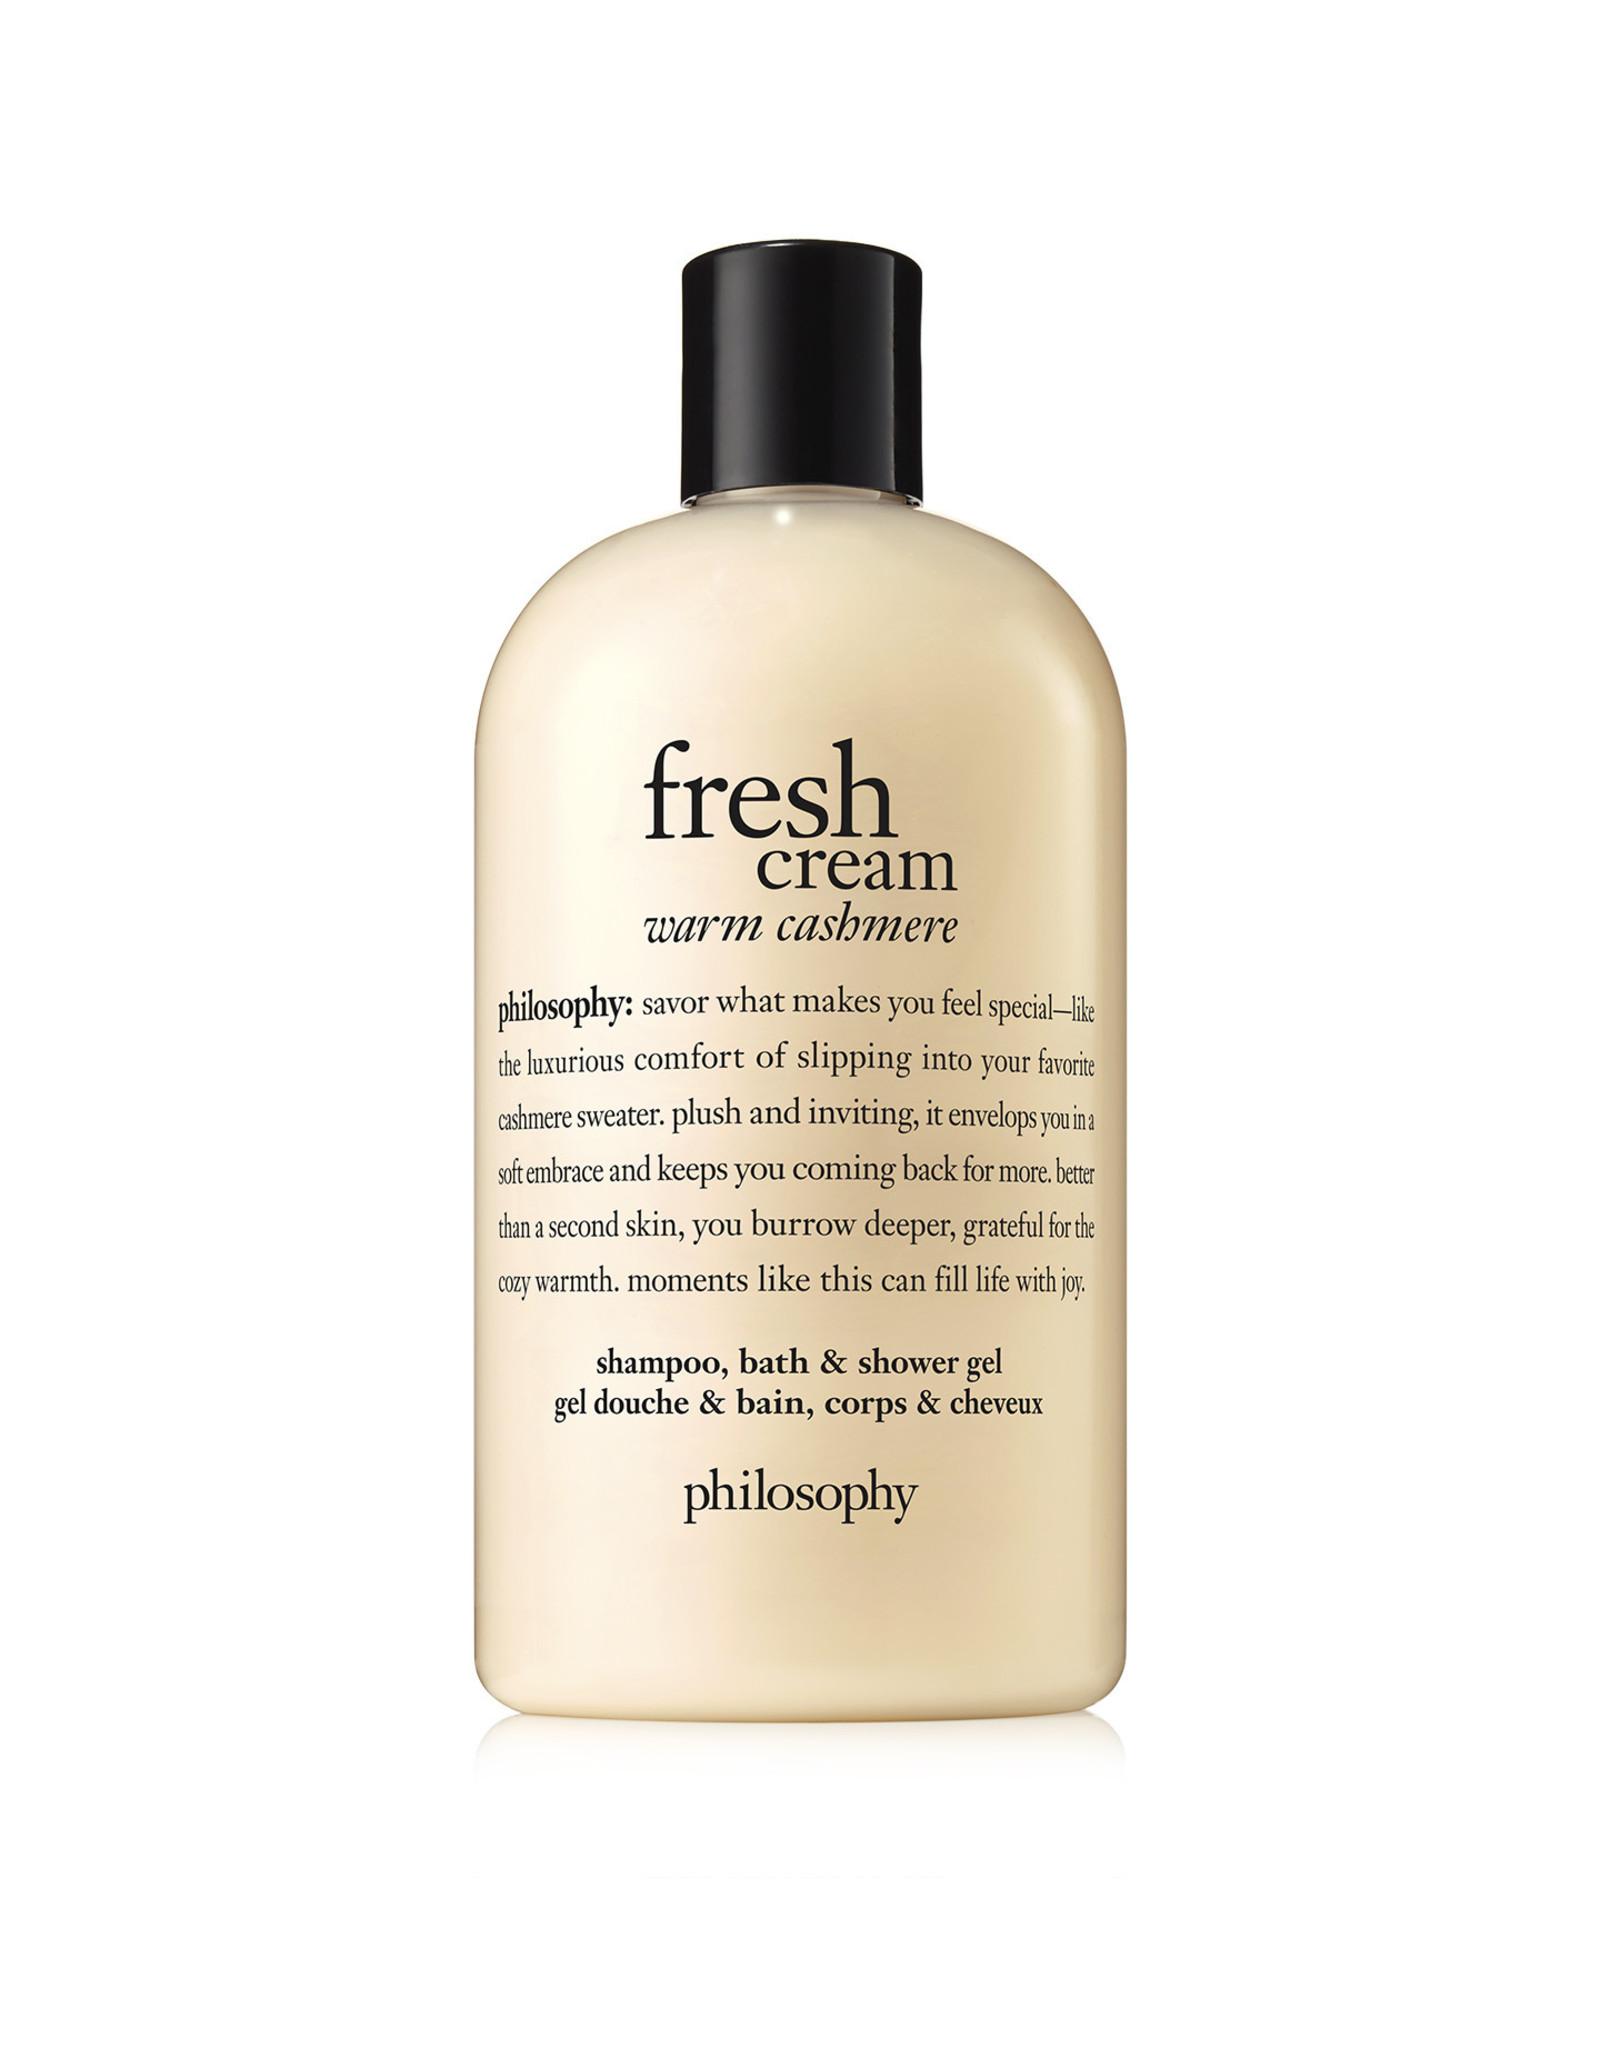 Philosophy Philosophy Shampoo, Shower Gel, and Bubble Bath 16oz